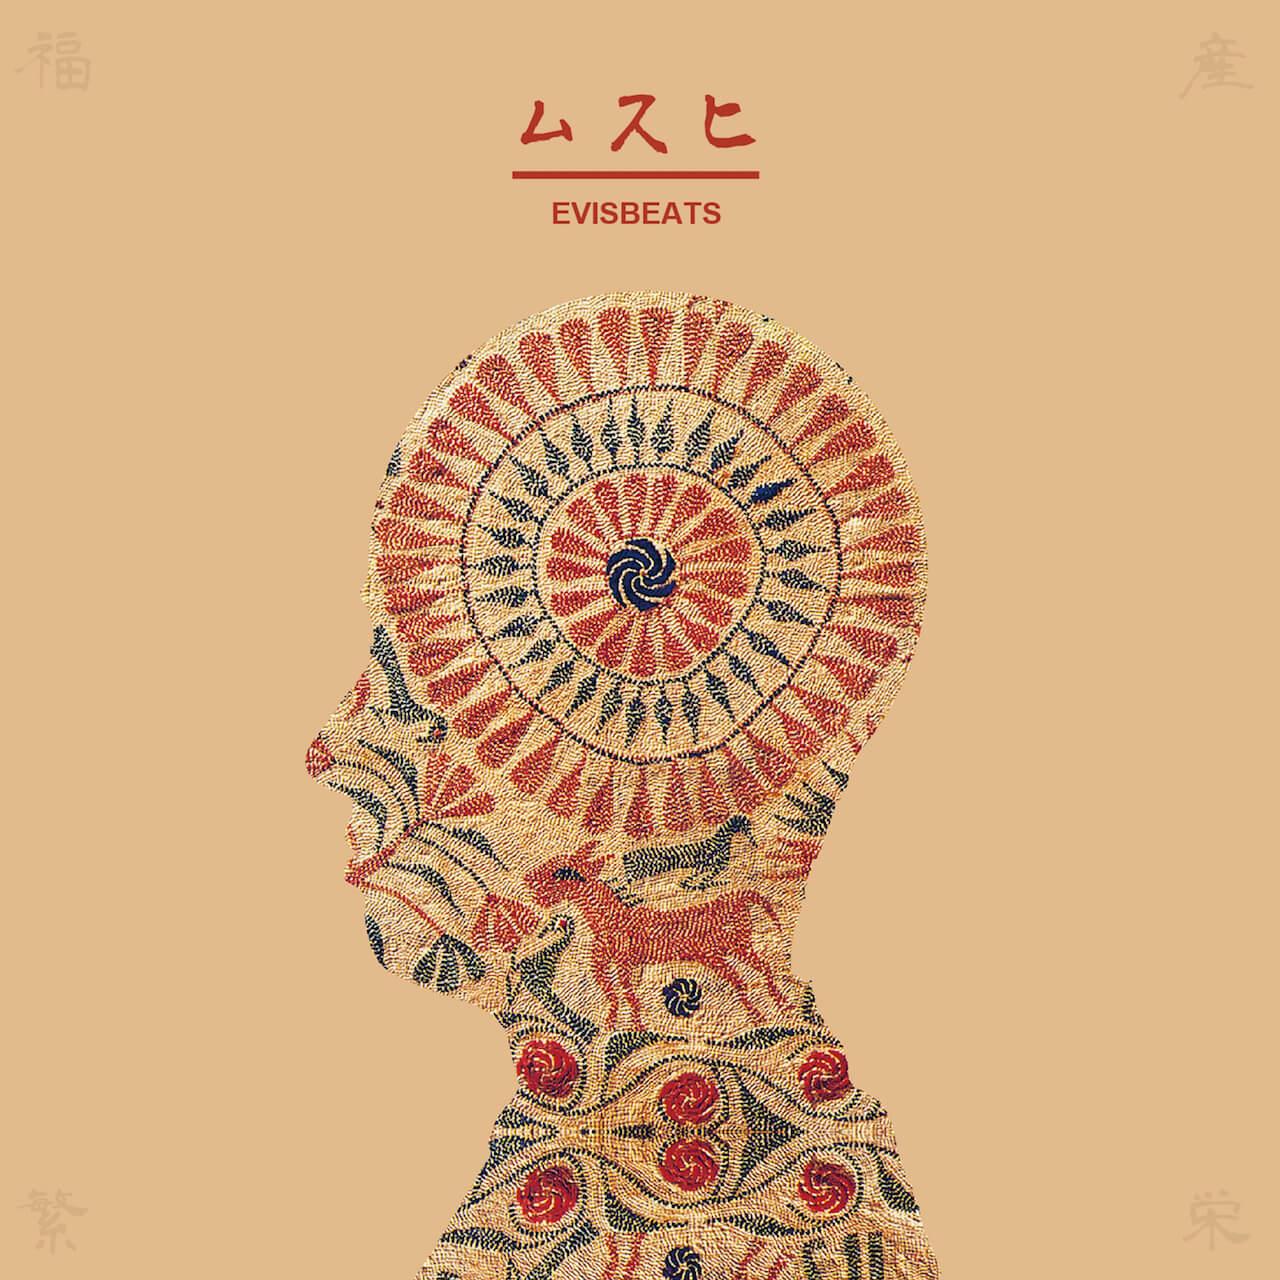 EVISBEATSの最新アルバム「PEOPLE」が本日発売|さらにサブスク・ストリーミングが全面解禁 music191218-evisbeats-2-1